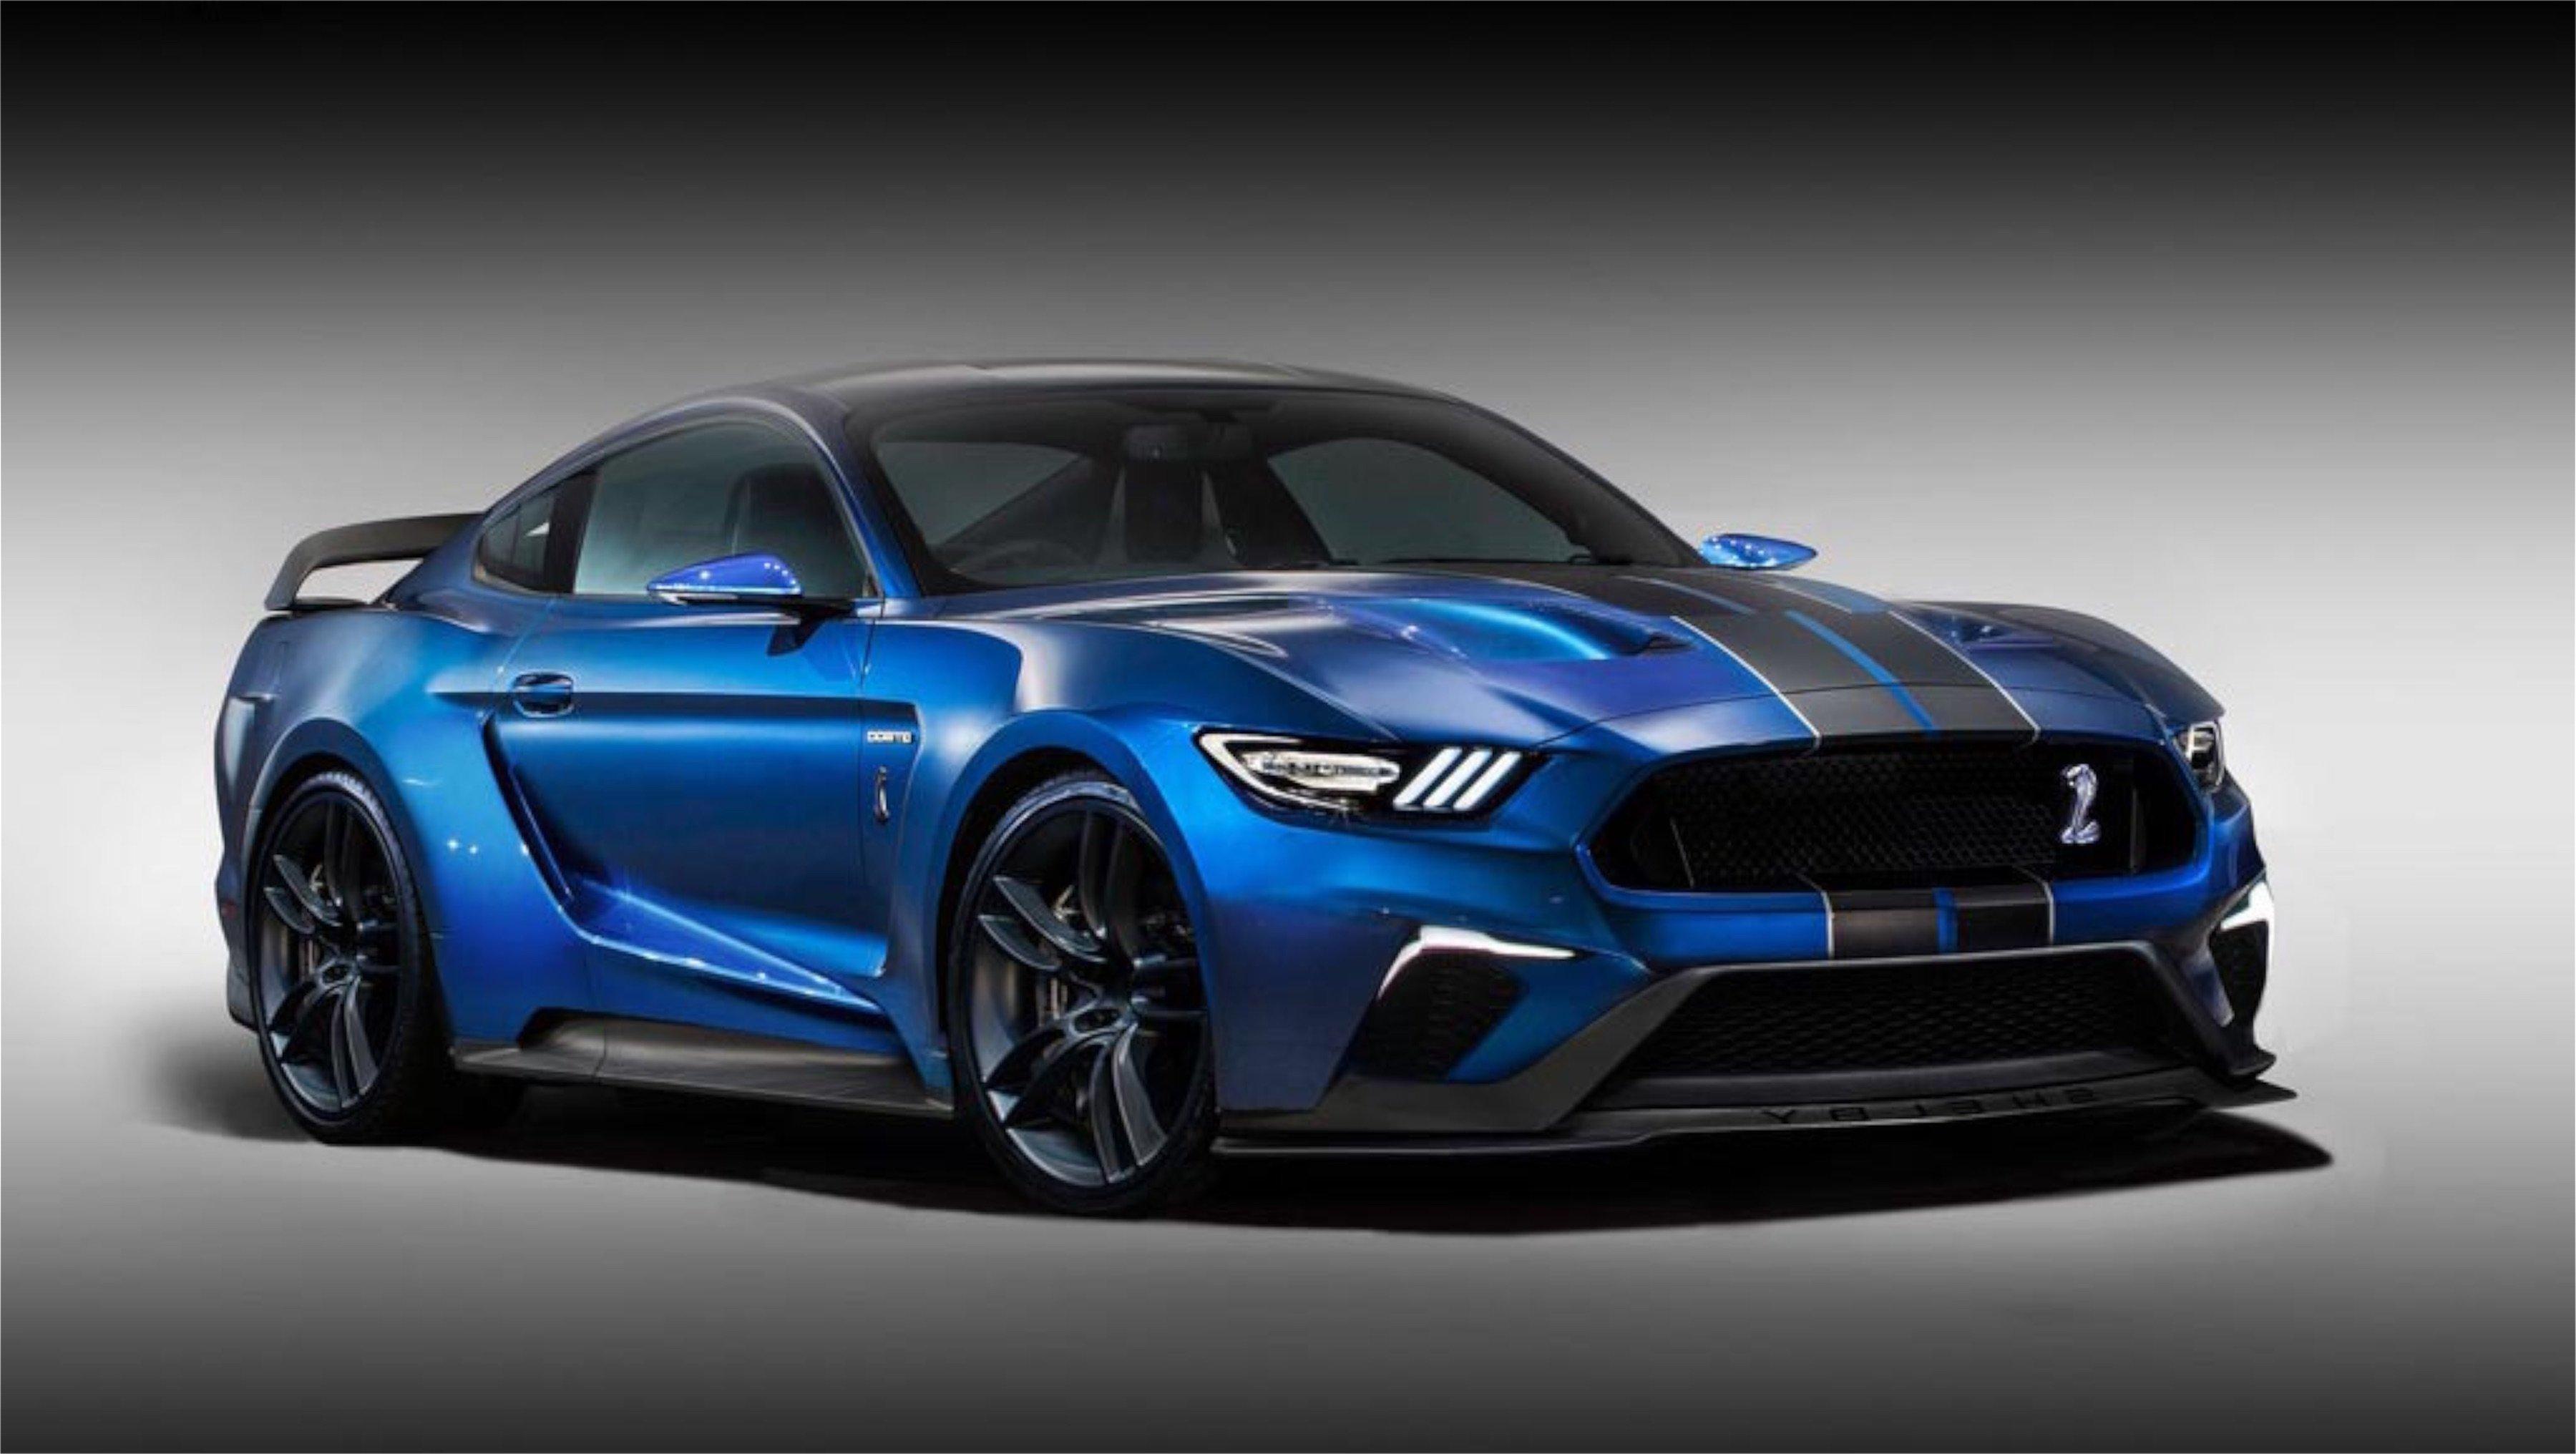 Next-Gen Shelby GT500 Predator 5.2 Engine Fully Exposed!